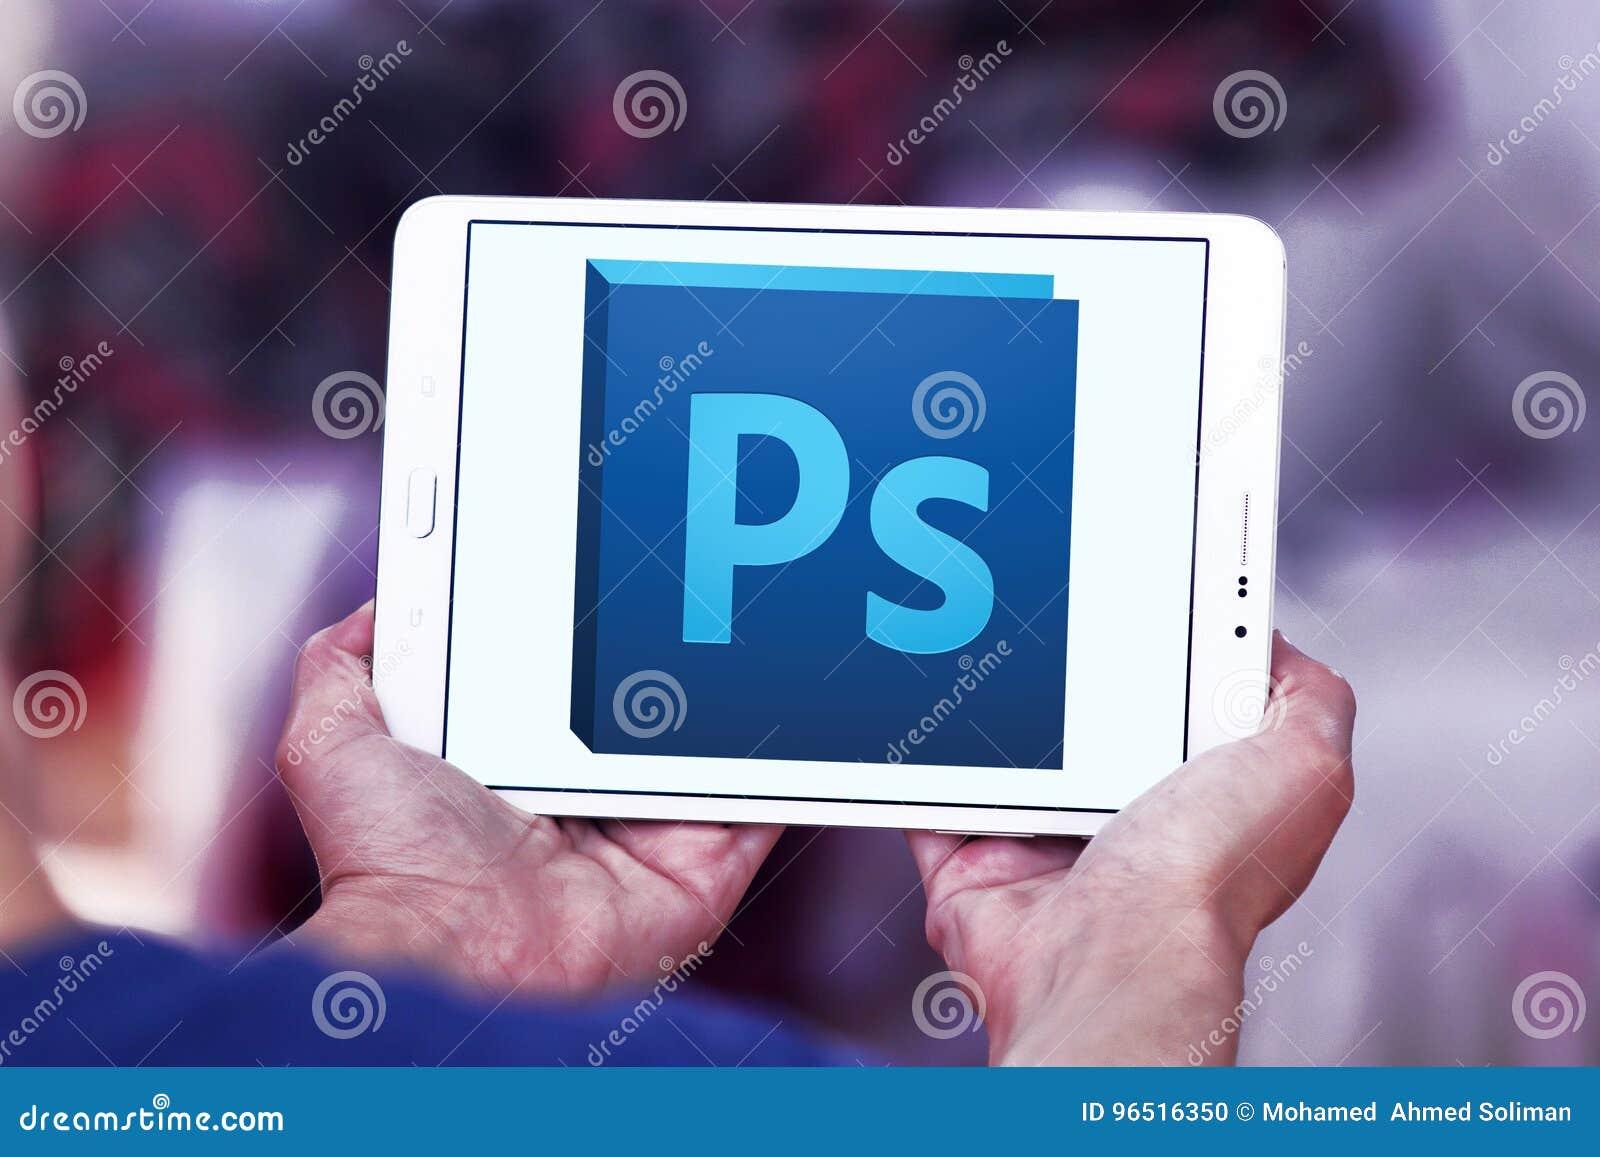 Adobe photoshop logo editorial image  Image of dreamweaver